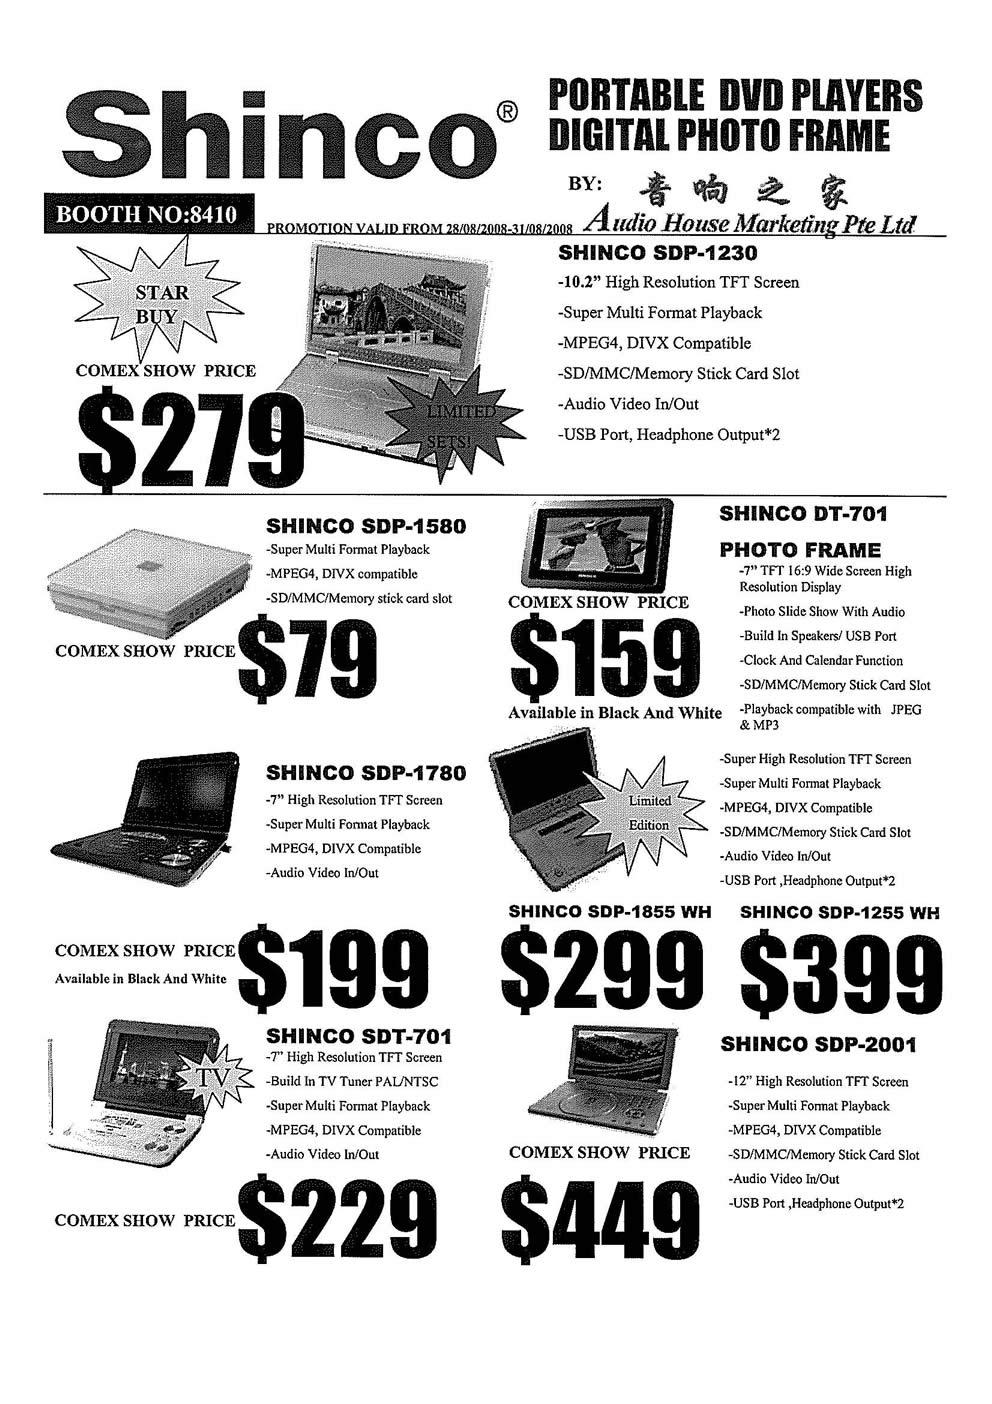 Comex 2008 price list image brochure of Shinco Page 1